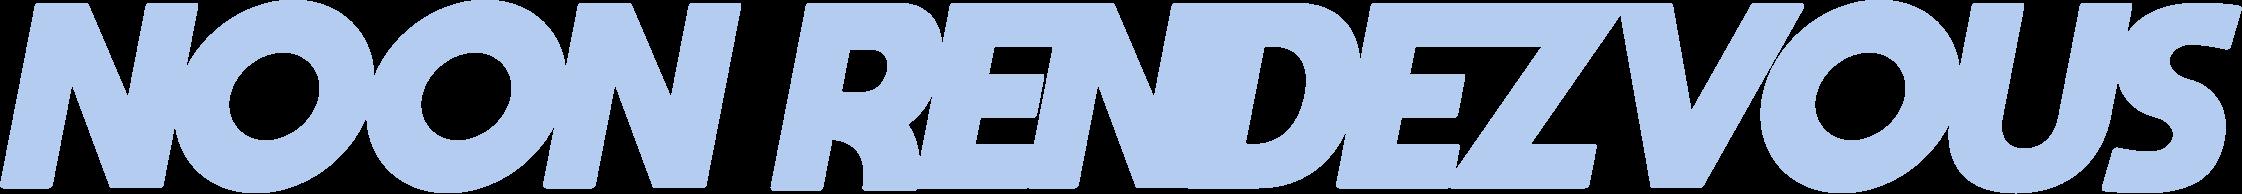 noon rendezvous logo.png